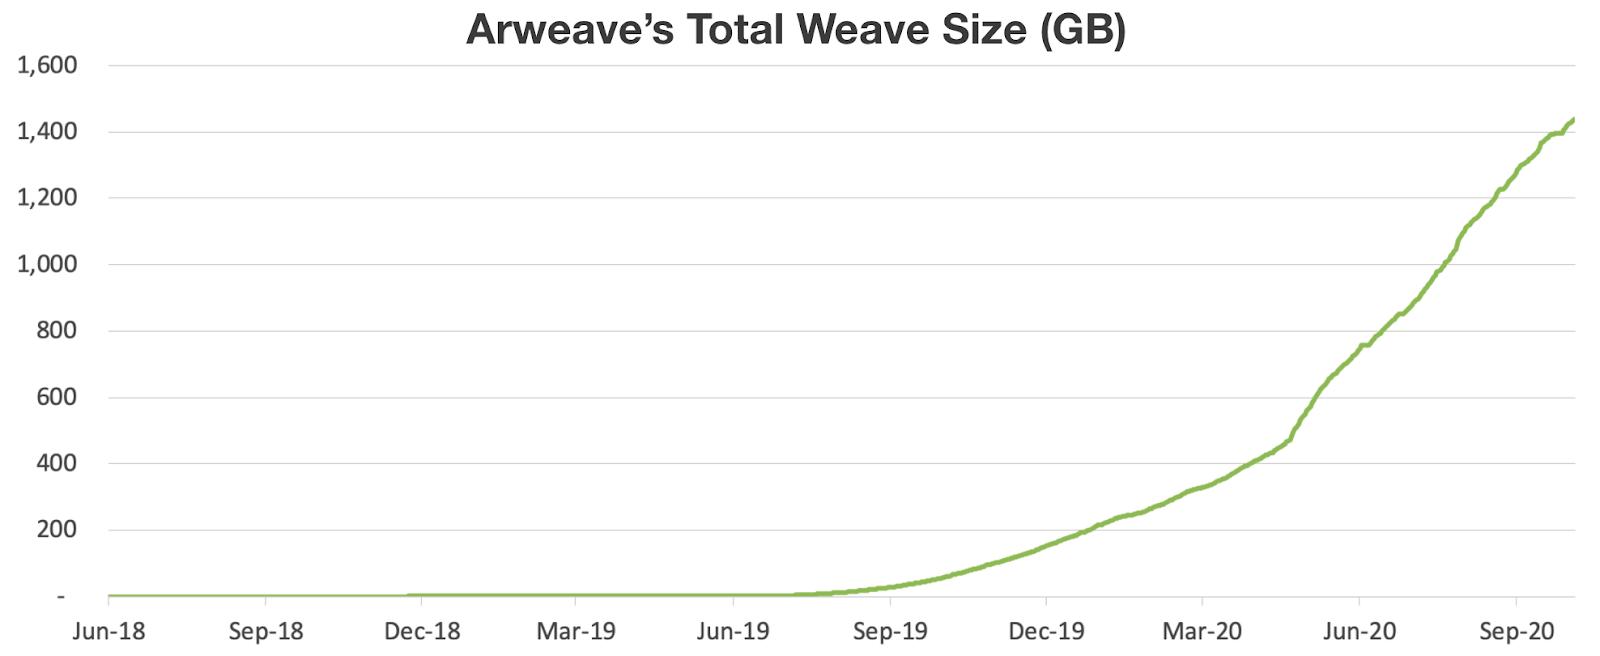 arweaveの合計織りサイズ(GB)